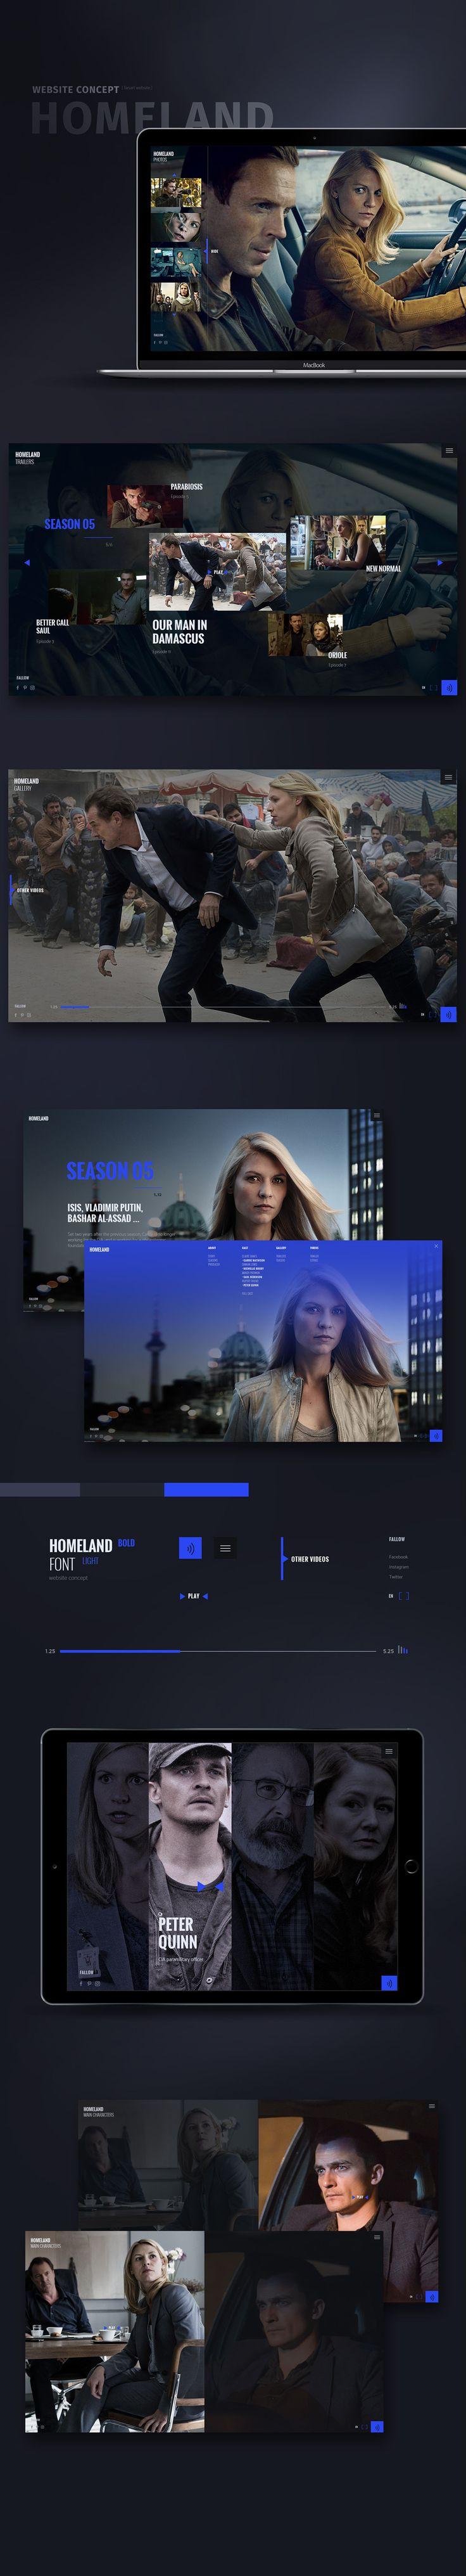 Homeland website concept on Behance